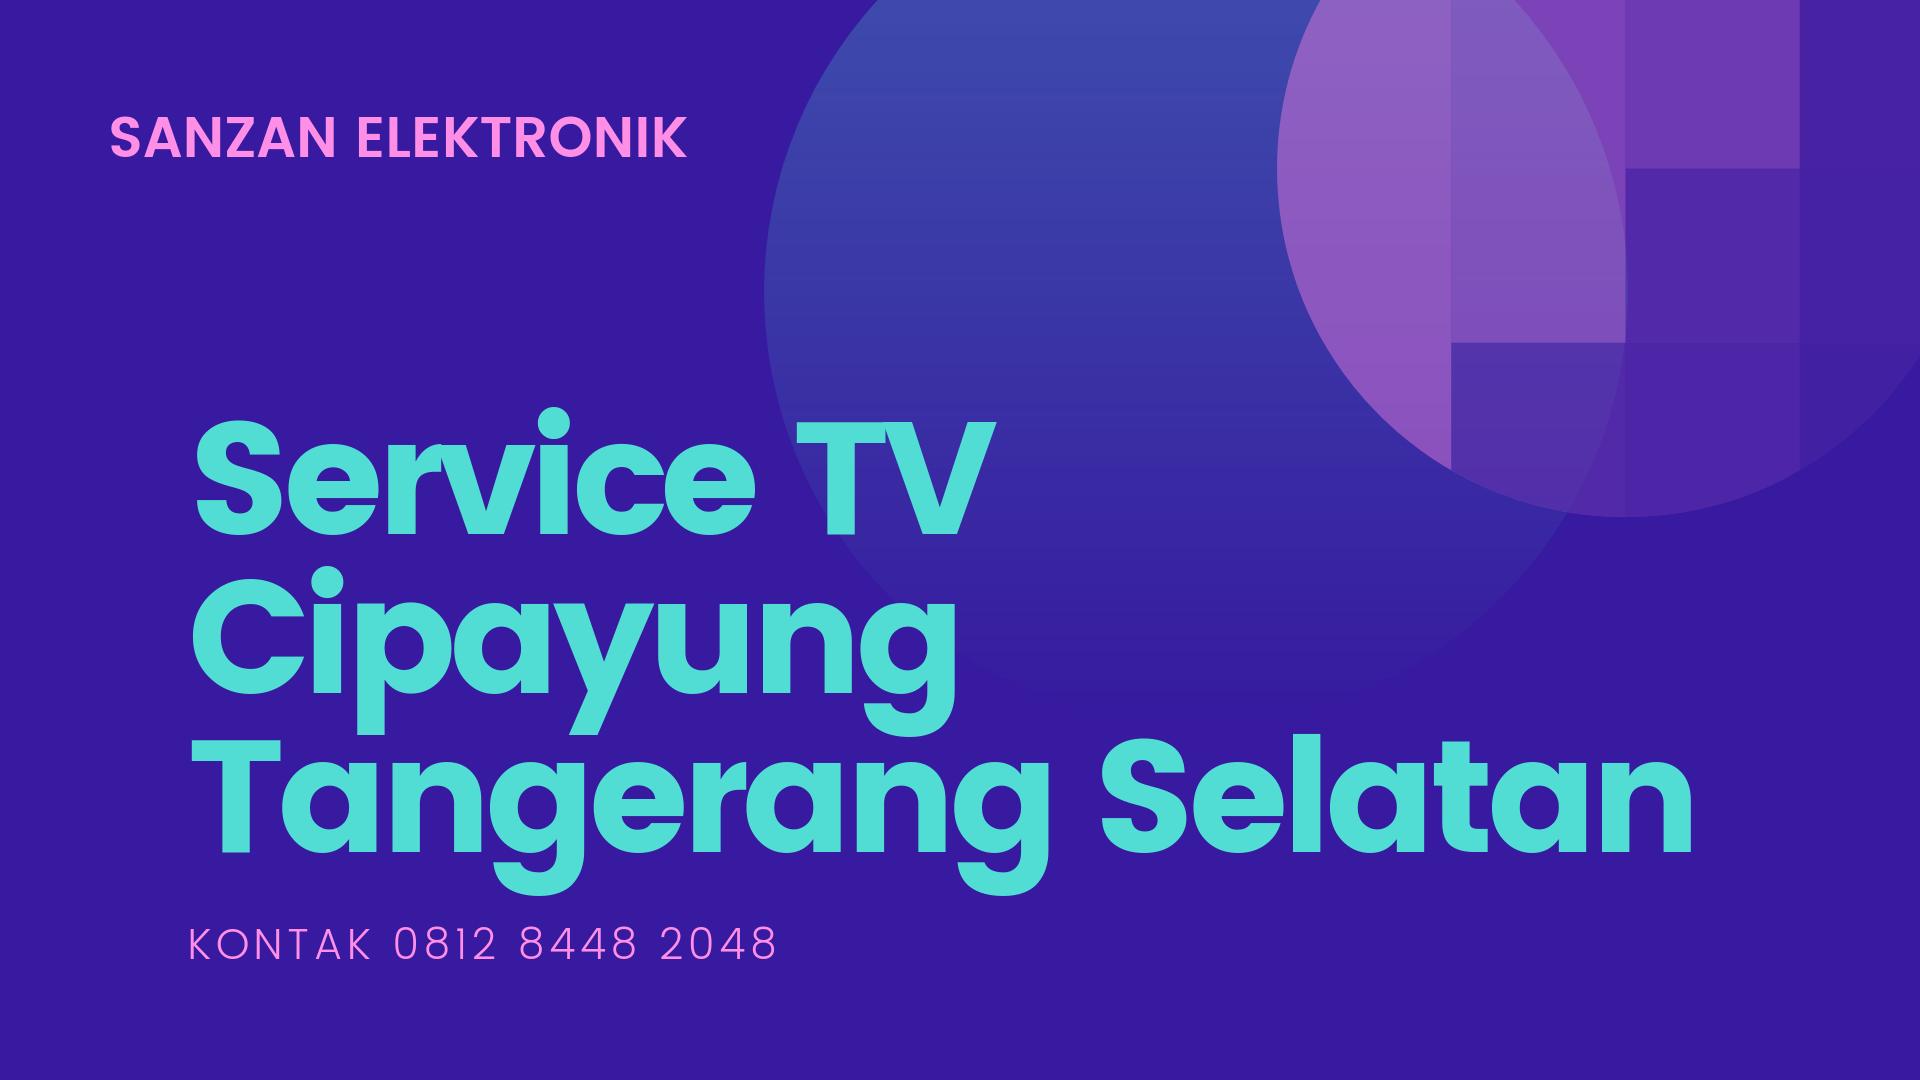 Service TV Cipayung Tangerang Selatan